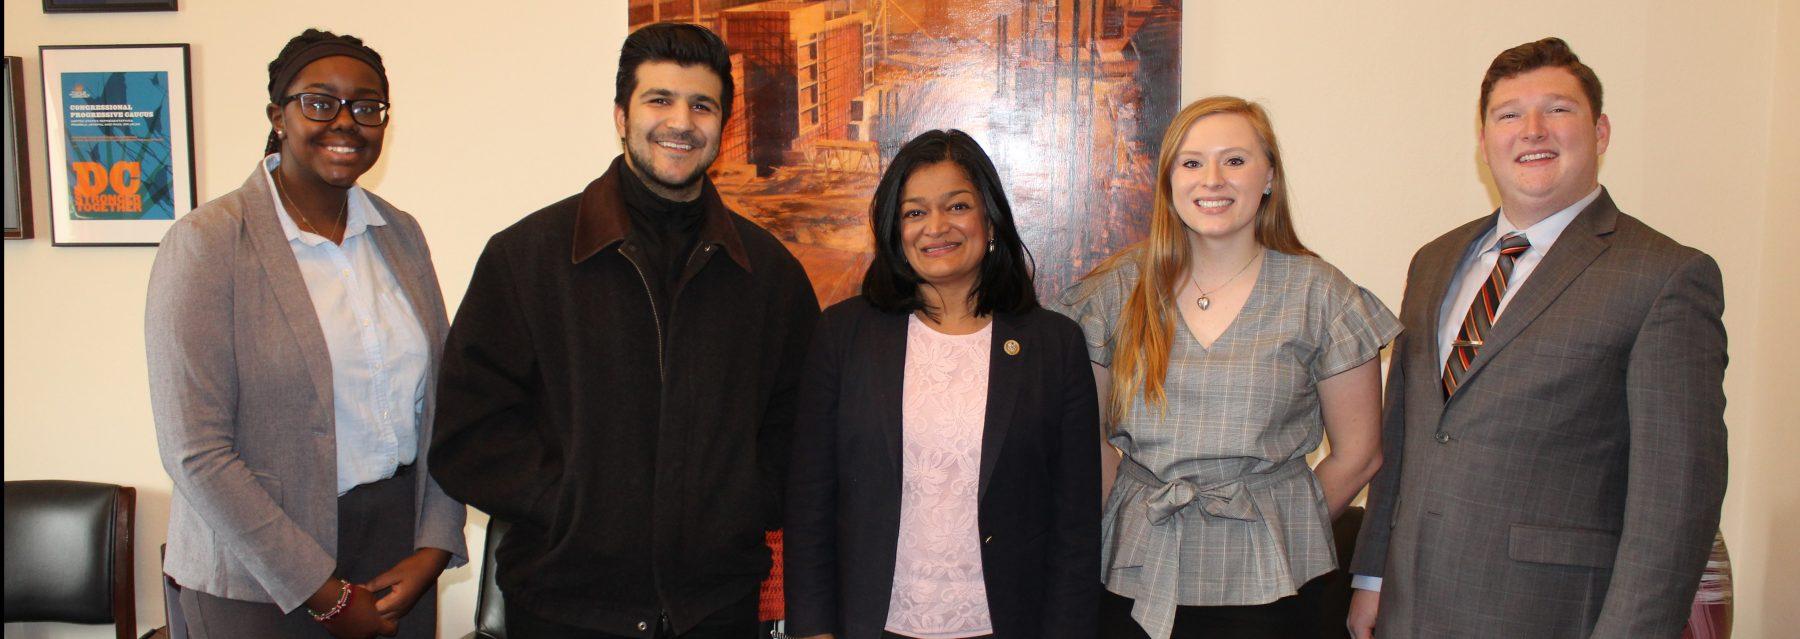 Internships - Congresswoman Pramila Jayapal